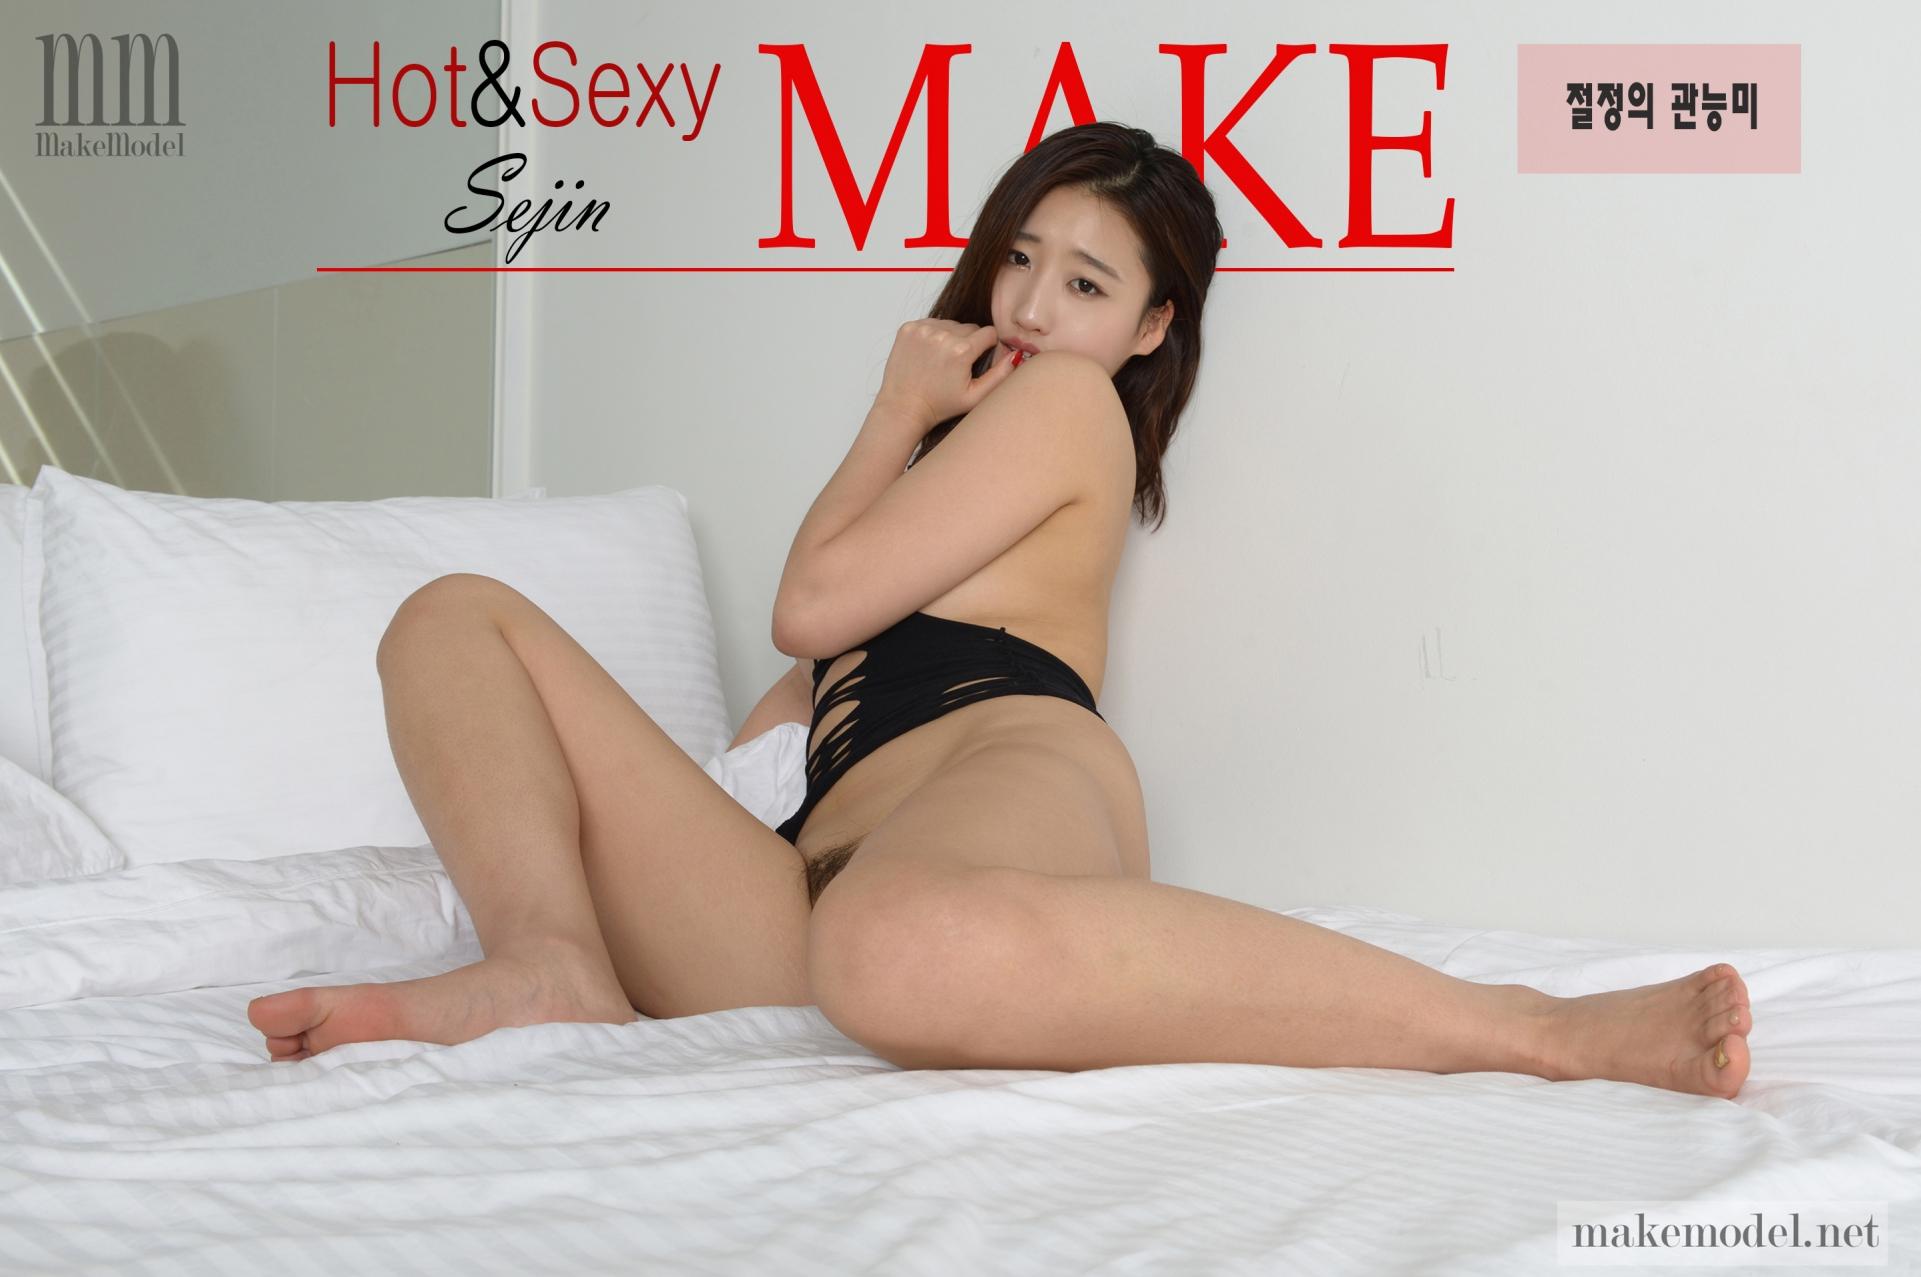 makemodel-SEJIN.절정의 관능미(61P) - 貼圖 - 清涼寫真 -